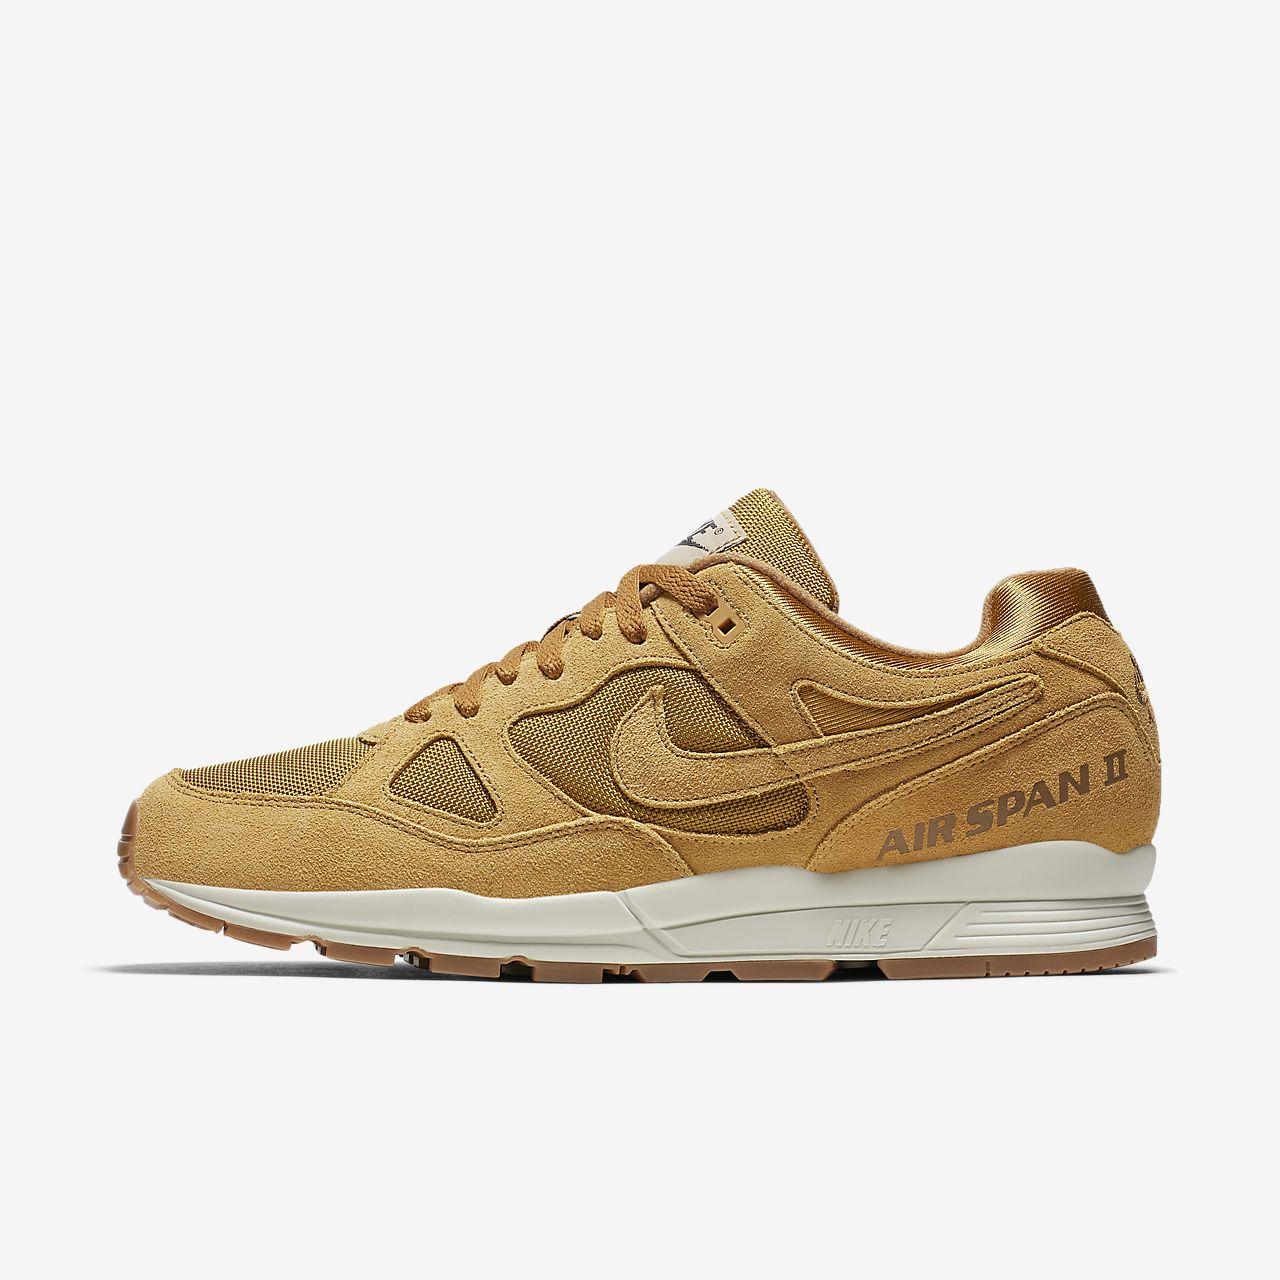 Nike Air Span II Premium Sko för män